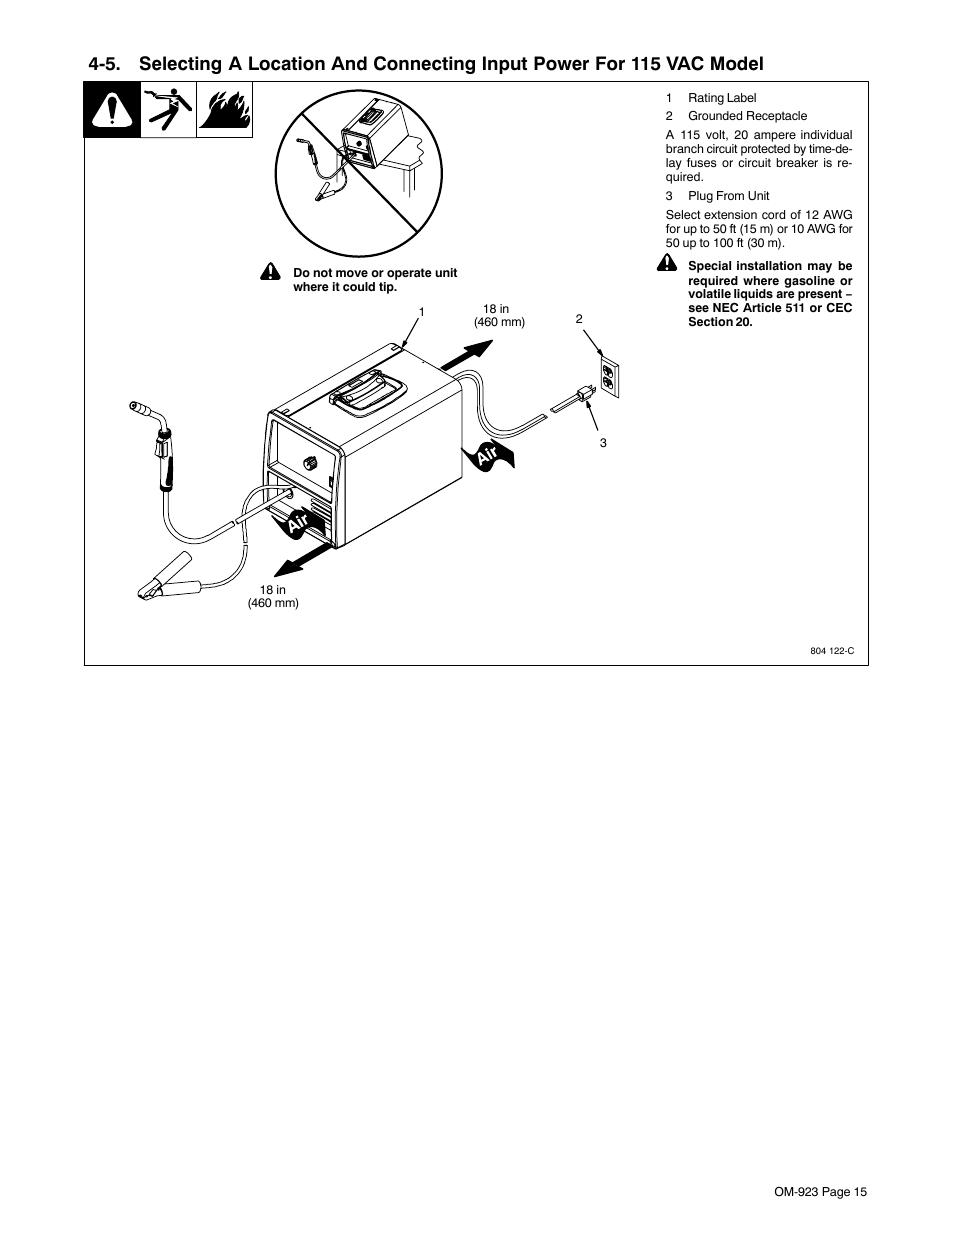 Hobart welder wiring diagram 460 saturn sl engine diagram slide out